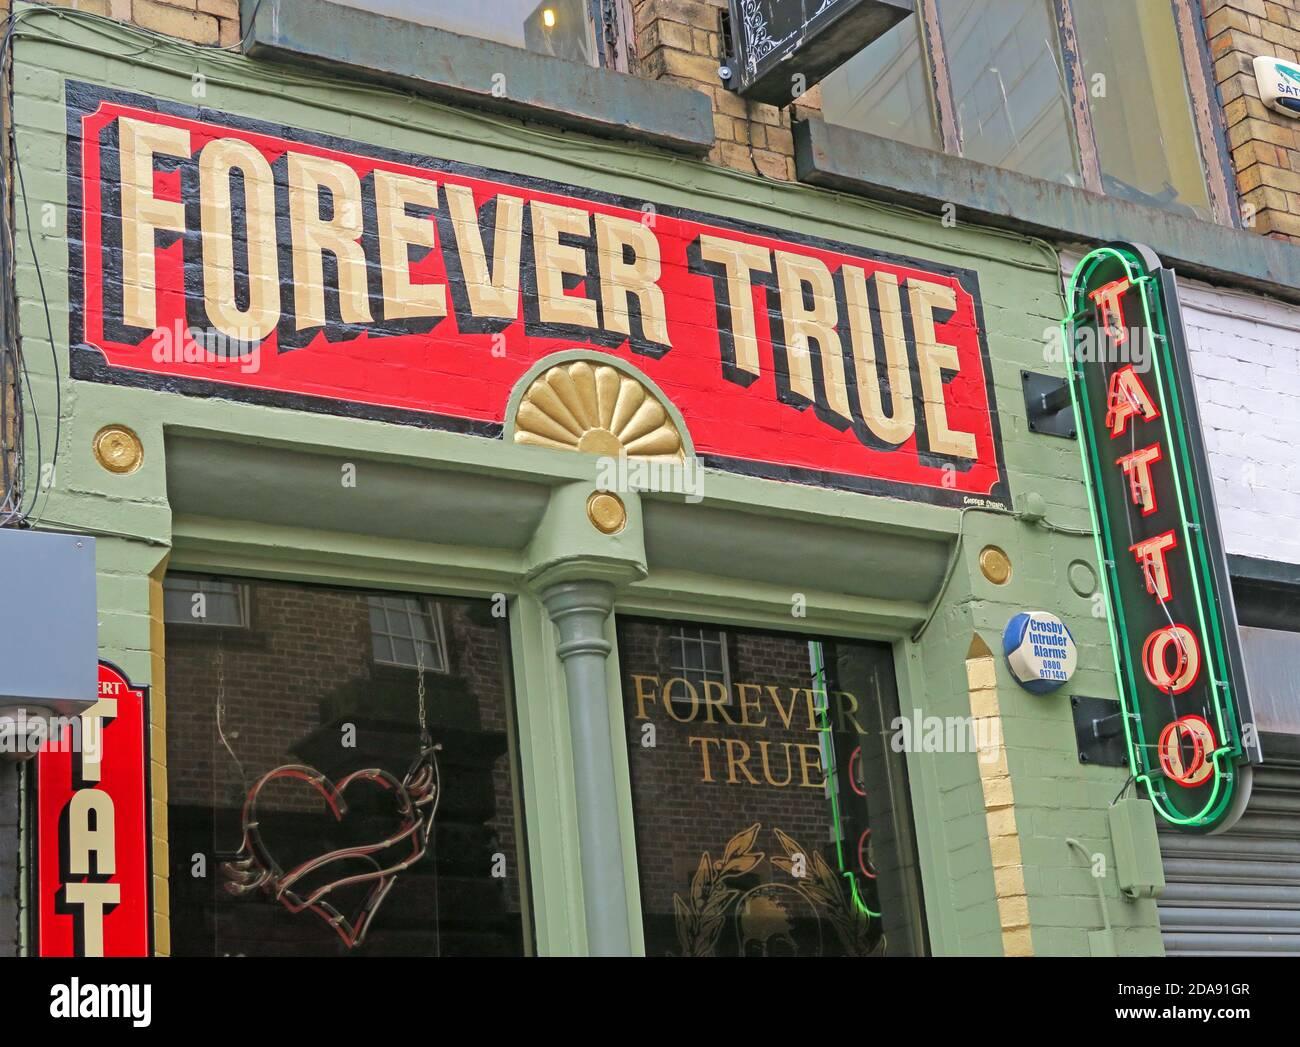 Dieses Stockfoto: Forever True Tattoo, 23 Cheapside, Liverpool, Merseyside, England, Großbritannien, L2 2DY - 2DA91G